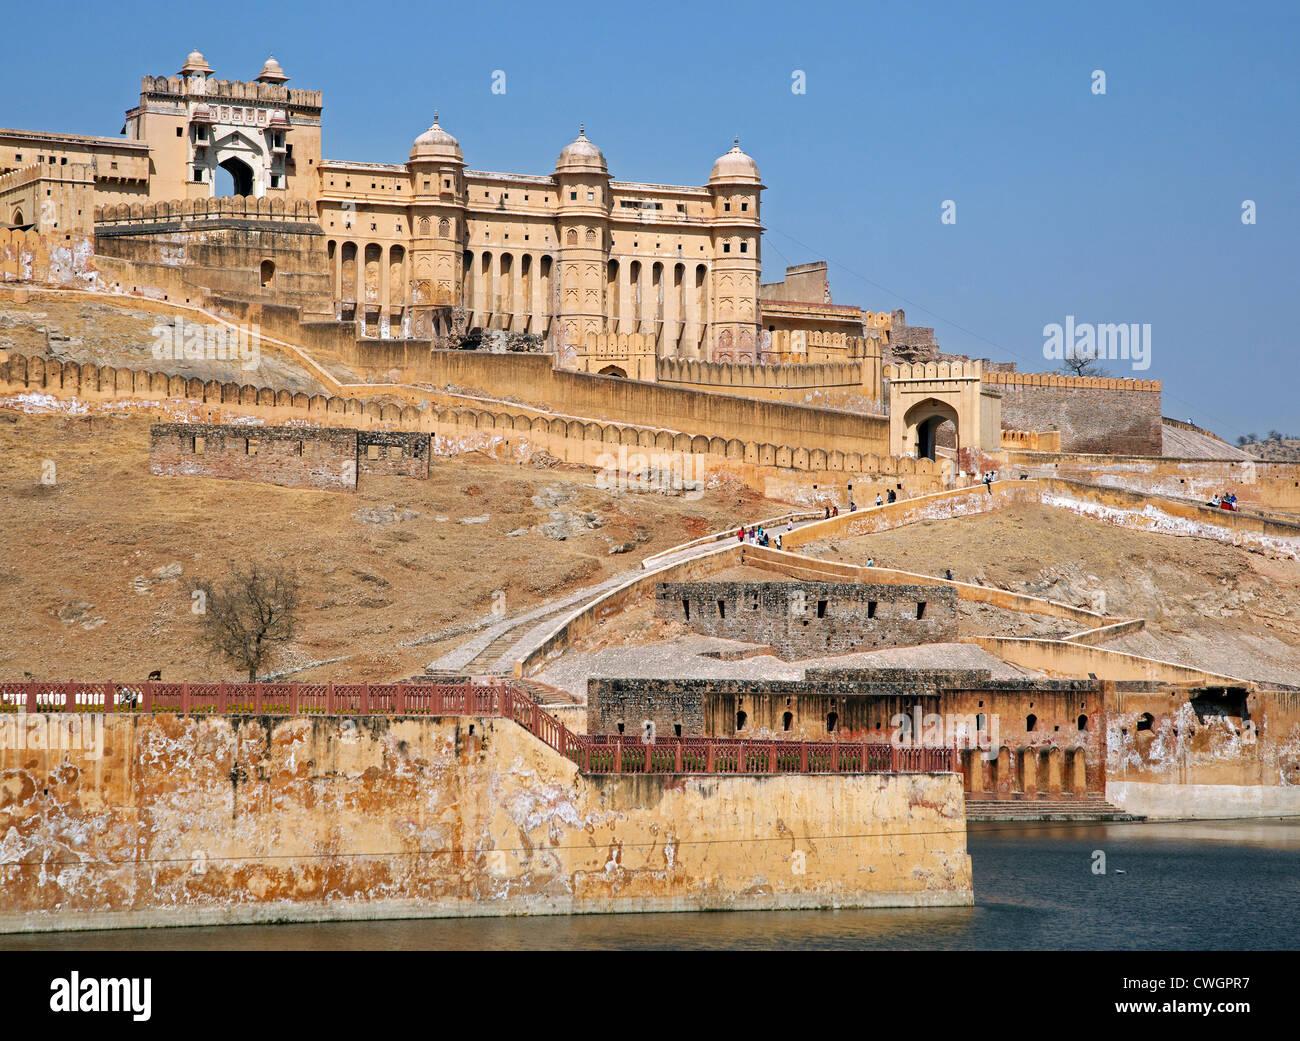 Fort Amer / Fort d'Amber, palais en grès rouge à Amer près de Jaipur, Rajasthan, Inde Photo Stock